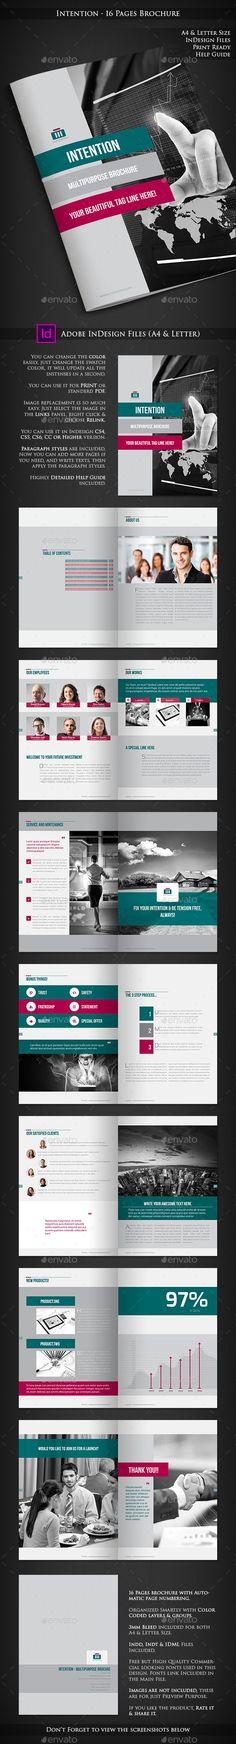 Gate Fold Interior Brochure-V458 Template, Creative and Brochure - microsoft word brochure templates free download